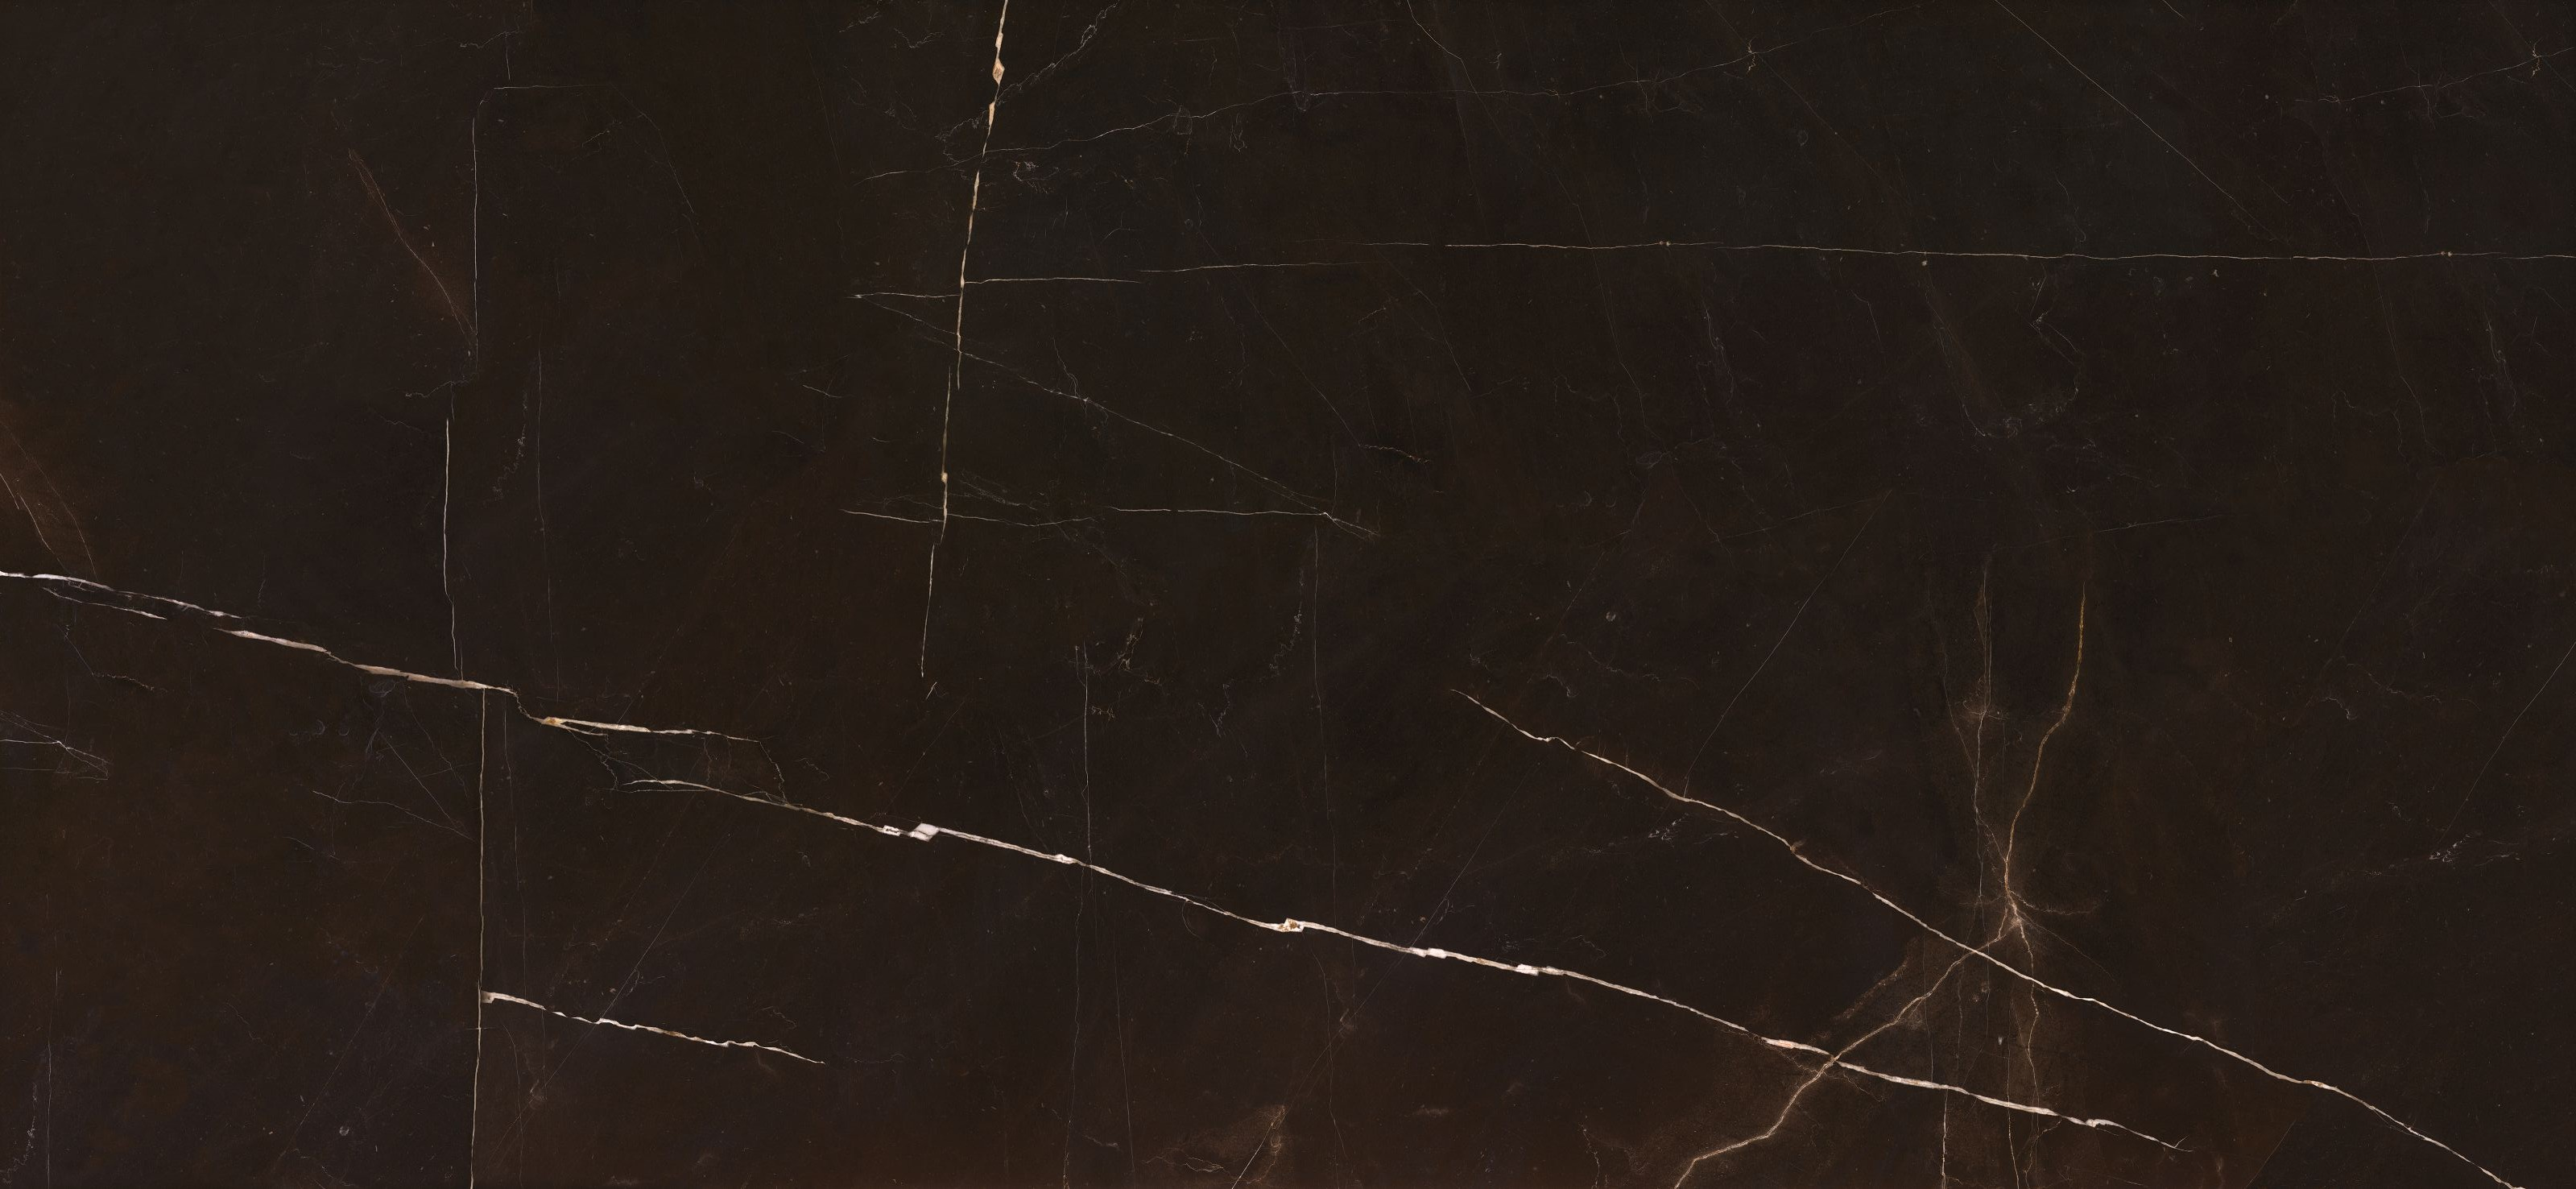 MAGMA BLACK-熔岩黑 X-LABS系列